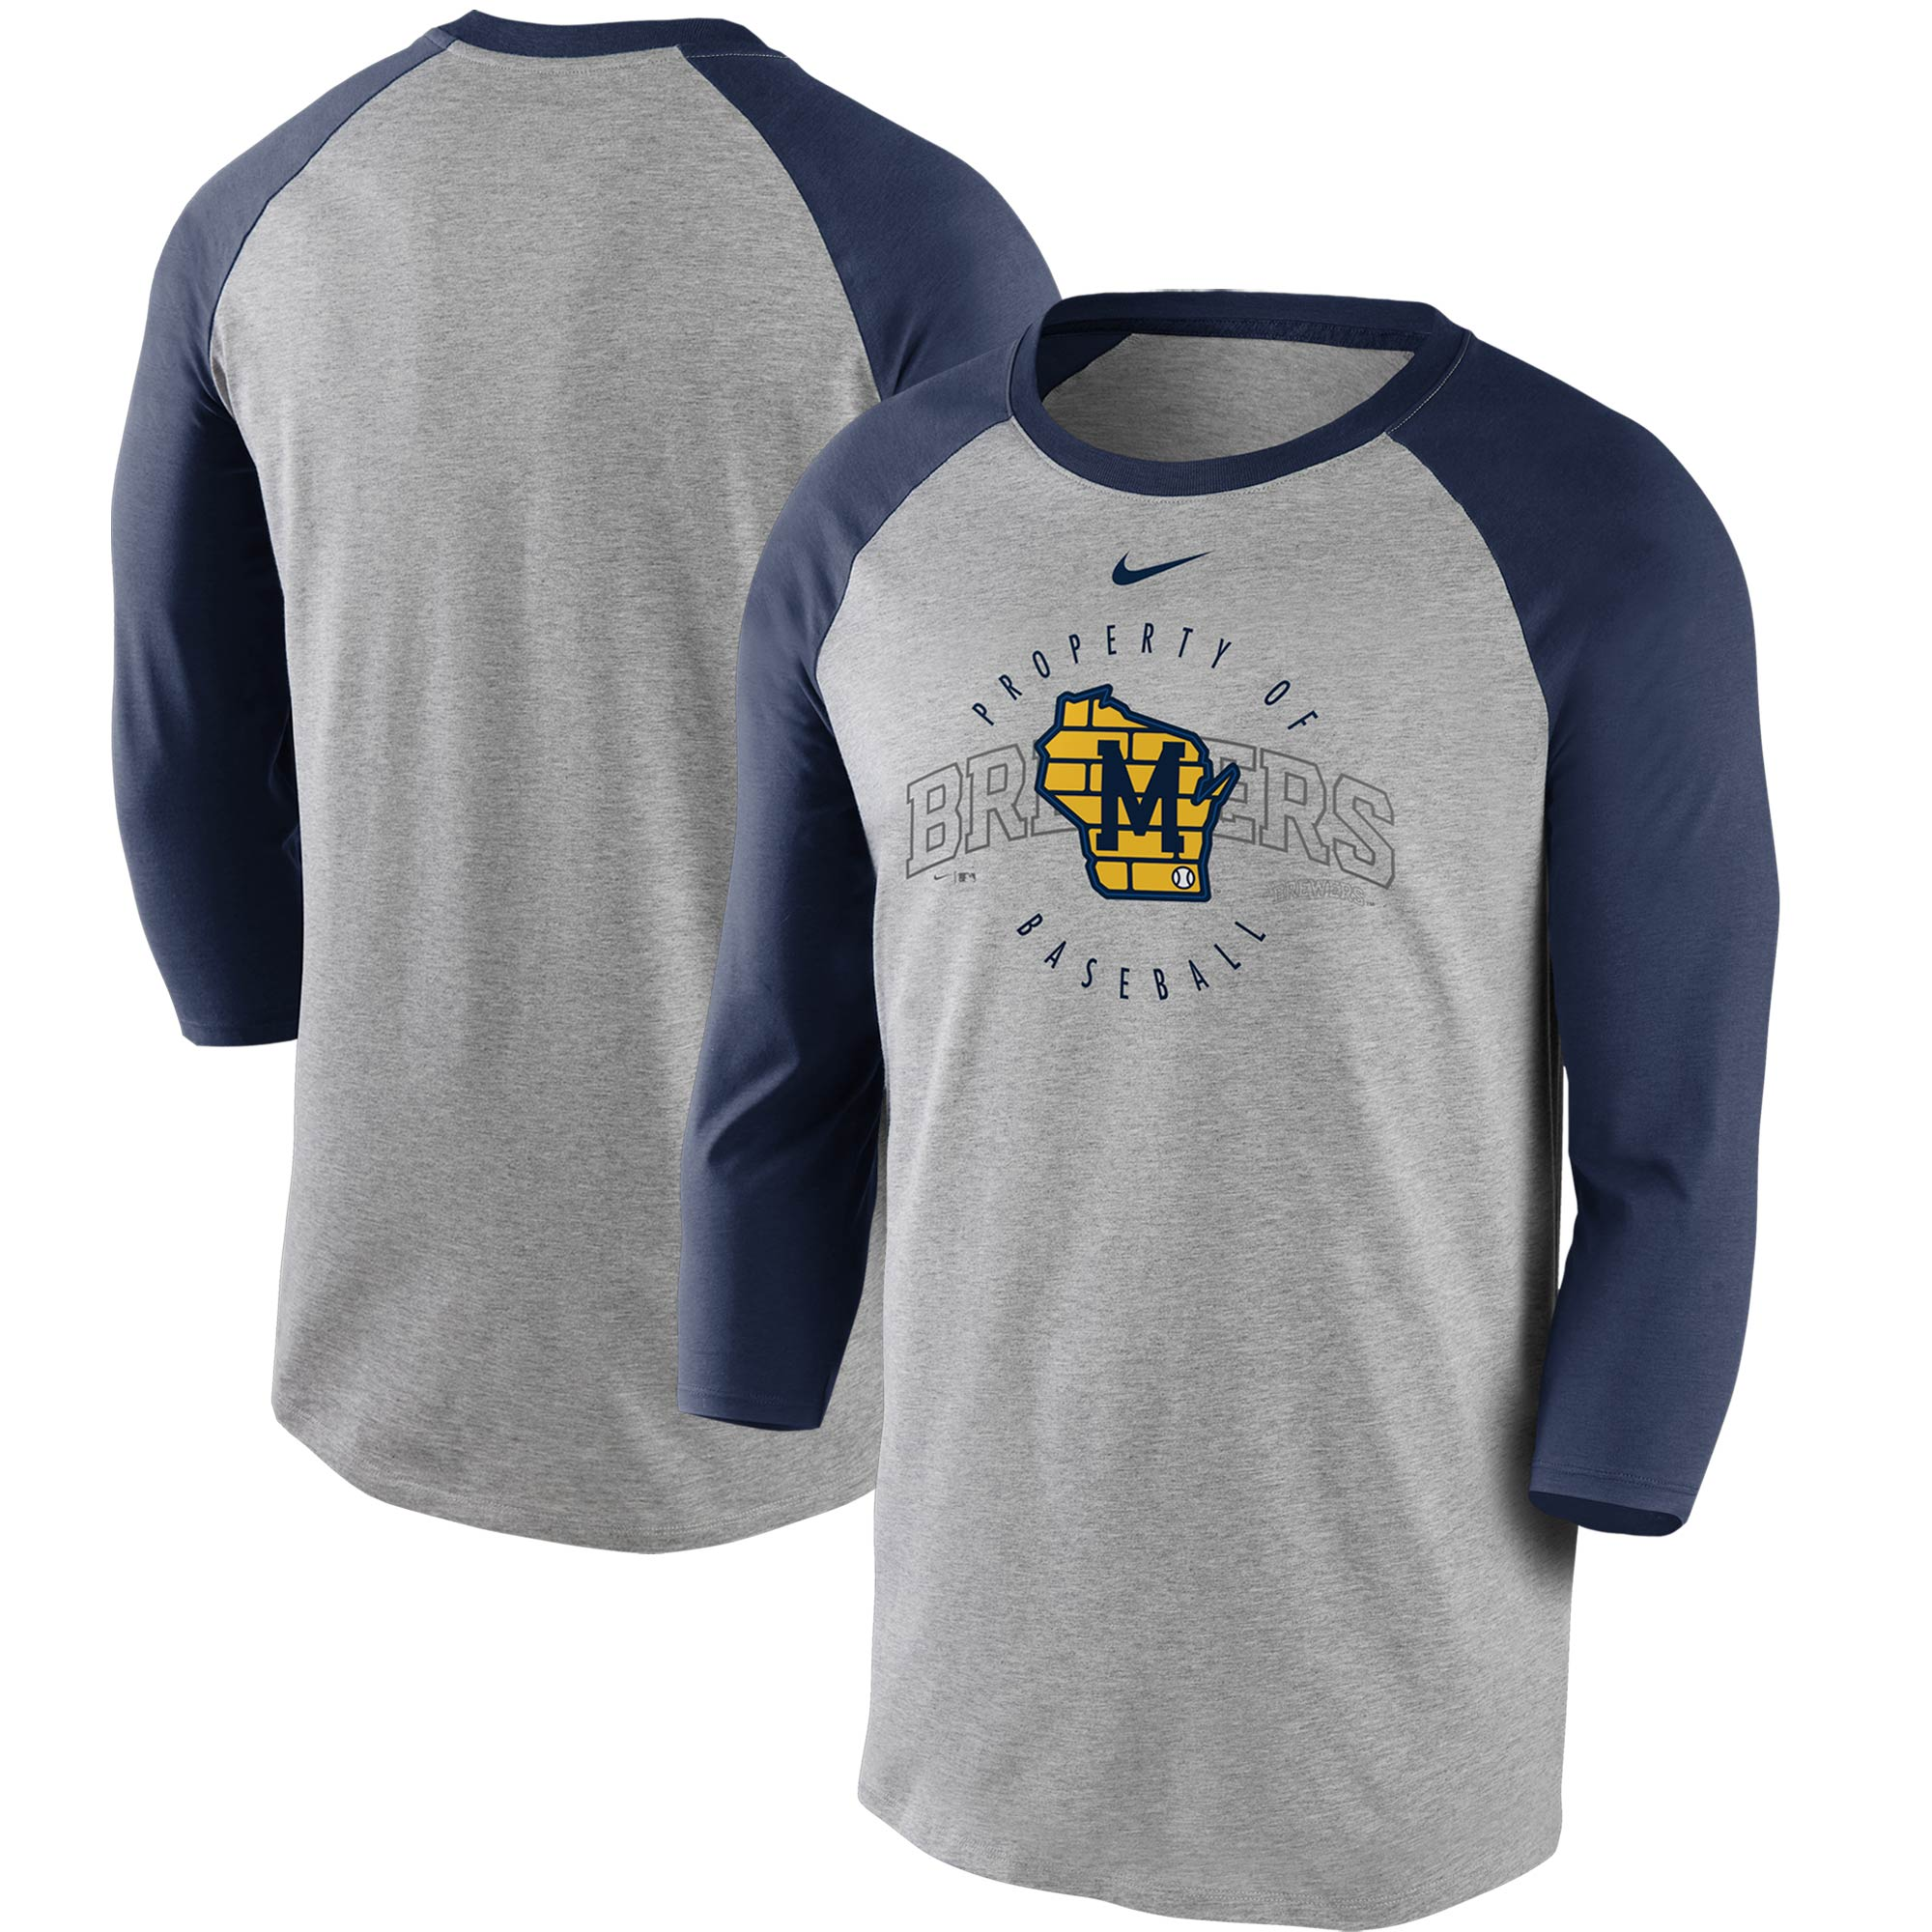 Milwaukee Brewers Nike Property Of Tri-Blend Raglan 3/4 Sleeve T-Shirt - Gray/Navy